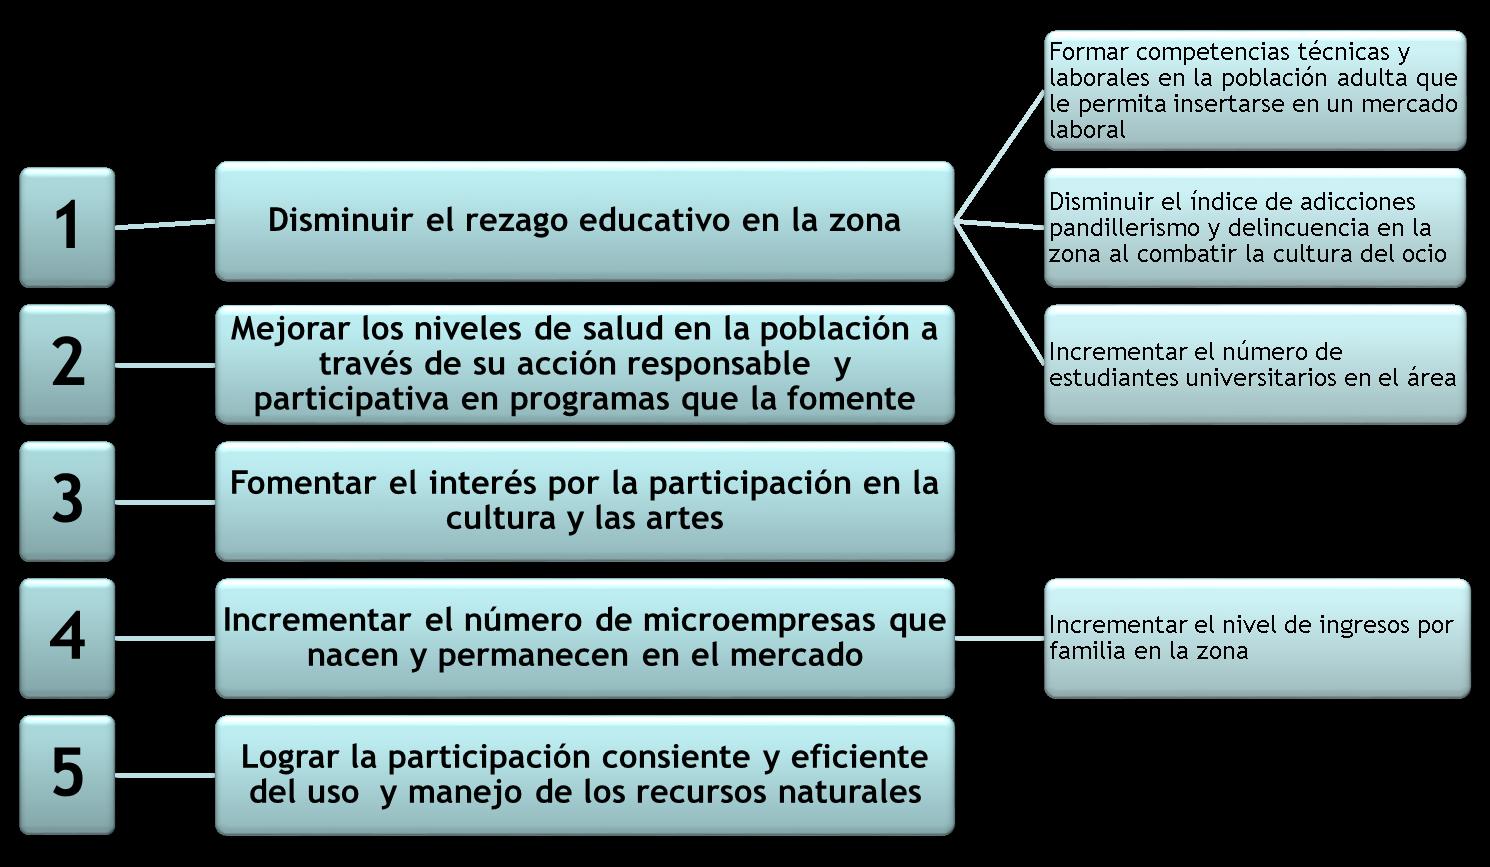 ITSON - Instituto Tecnologico de Sonora > CUDDEC > Objetivos